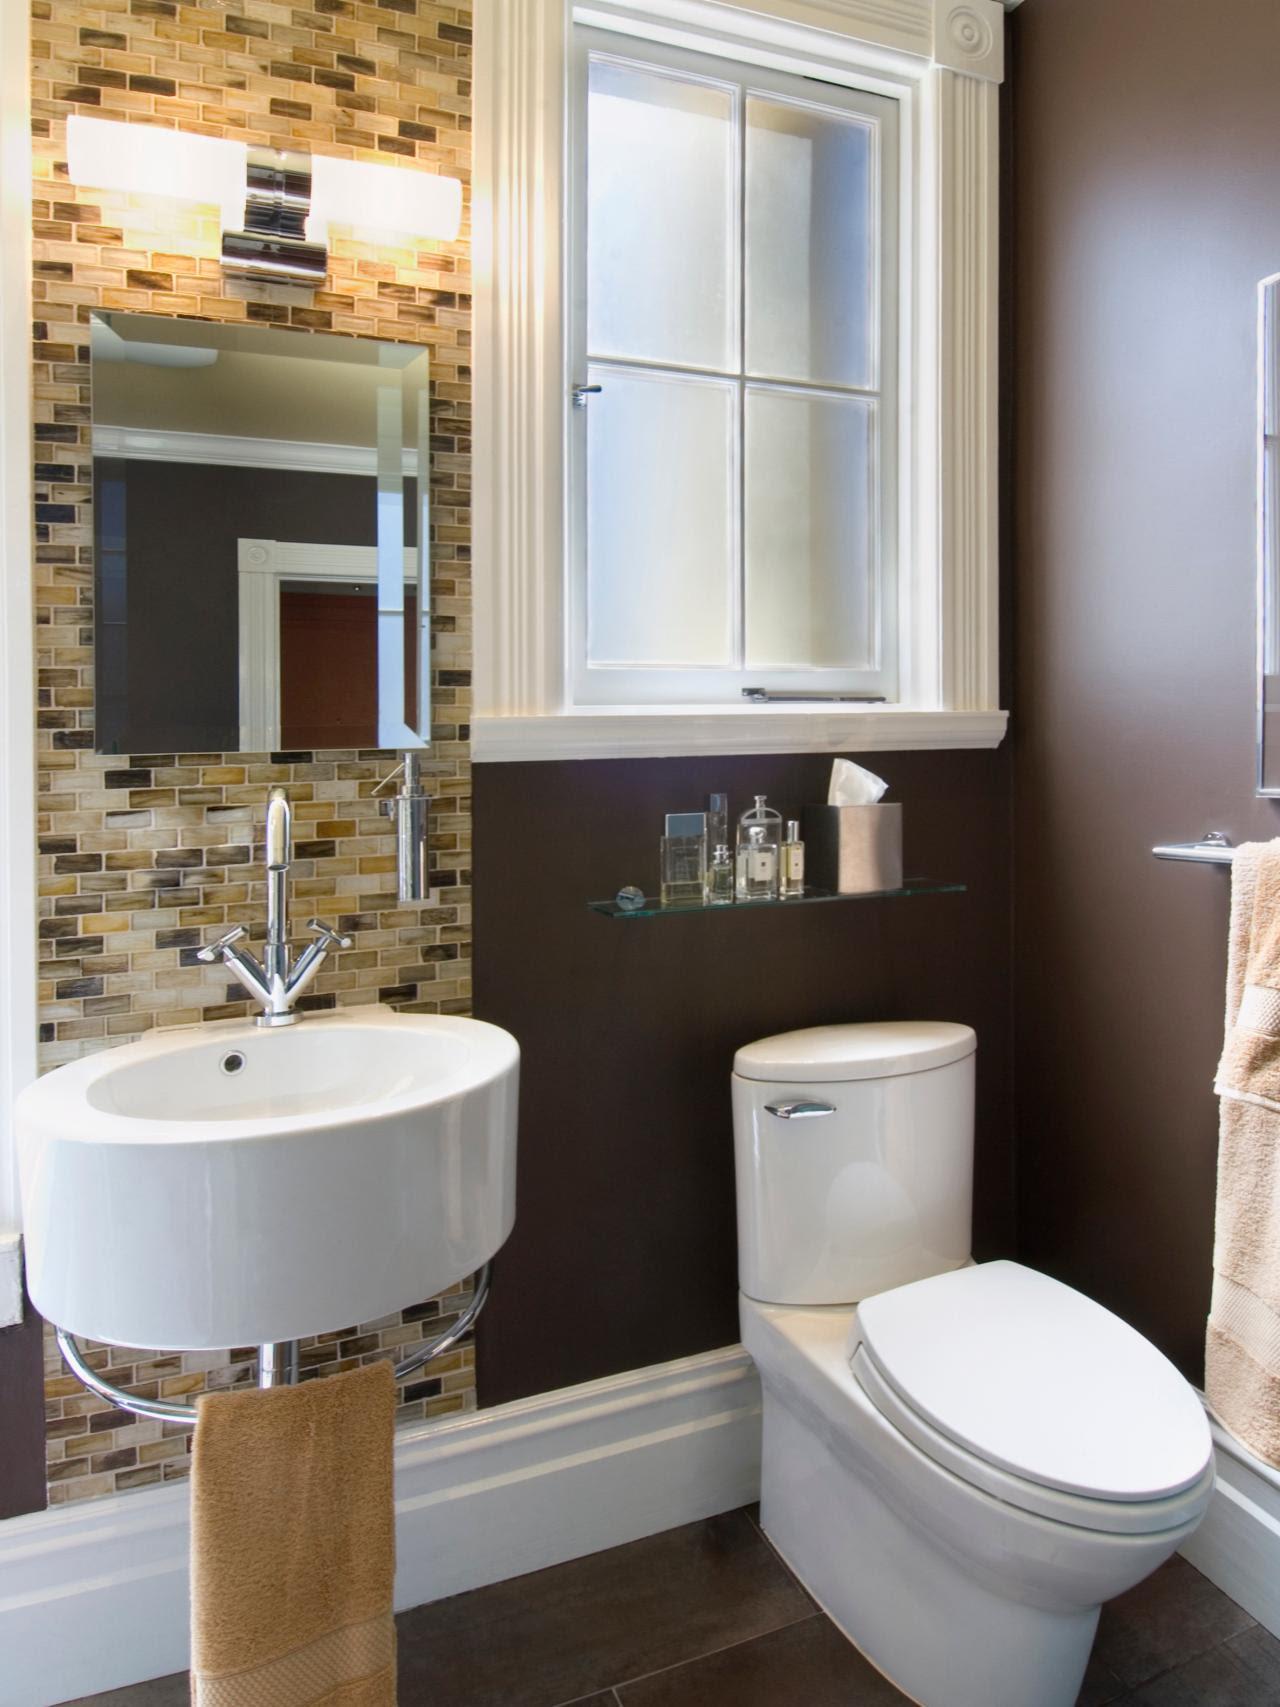 Small Bathrooms, Big Design | HGTV